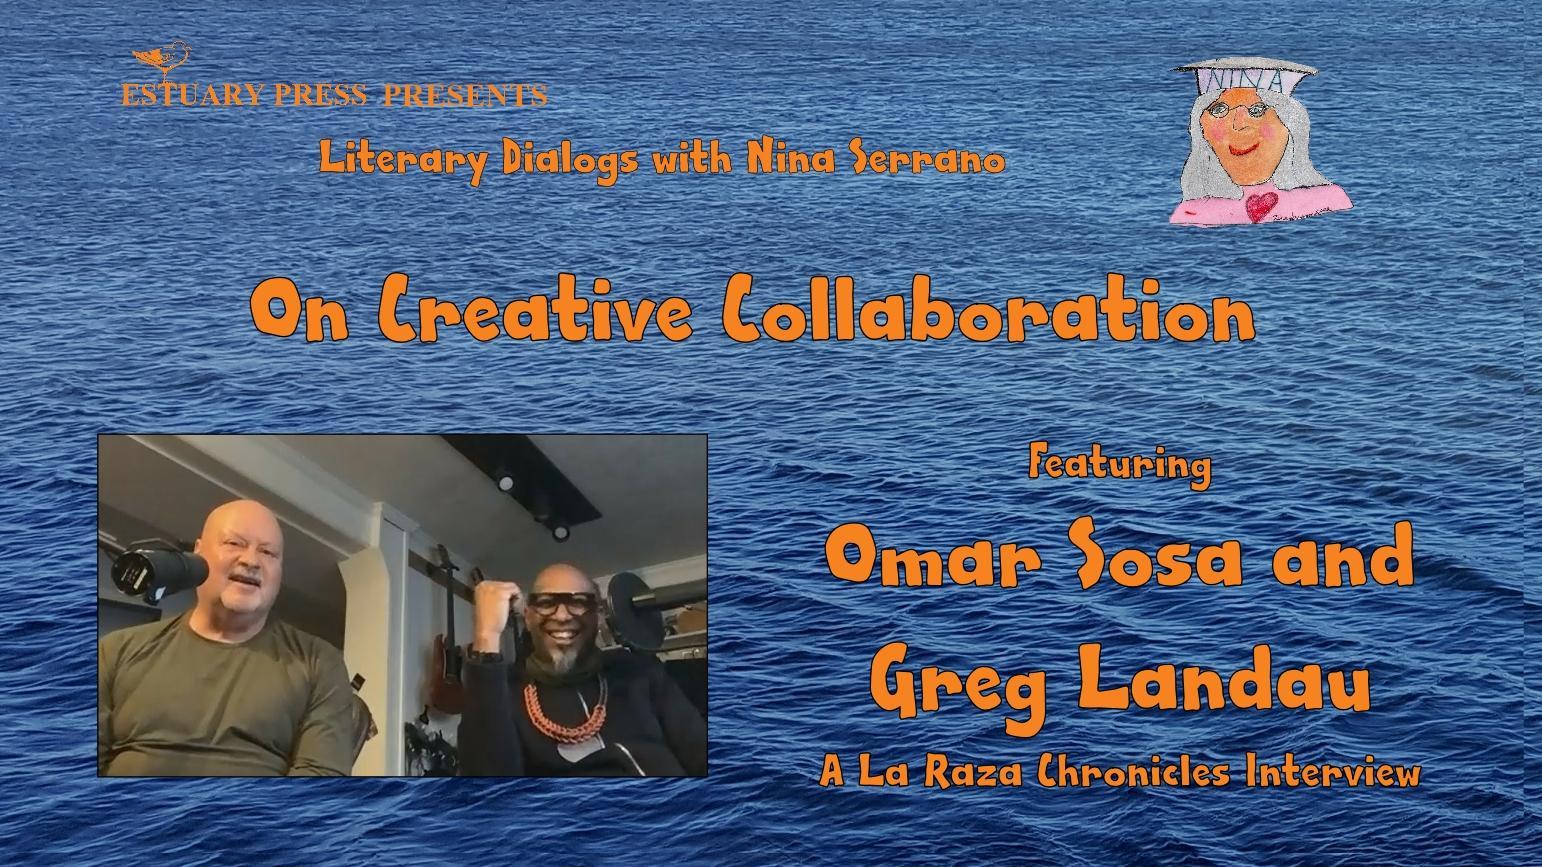 On Creative Collaboration graphic